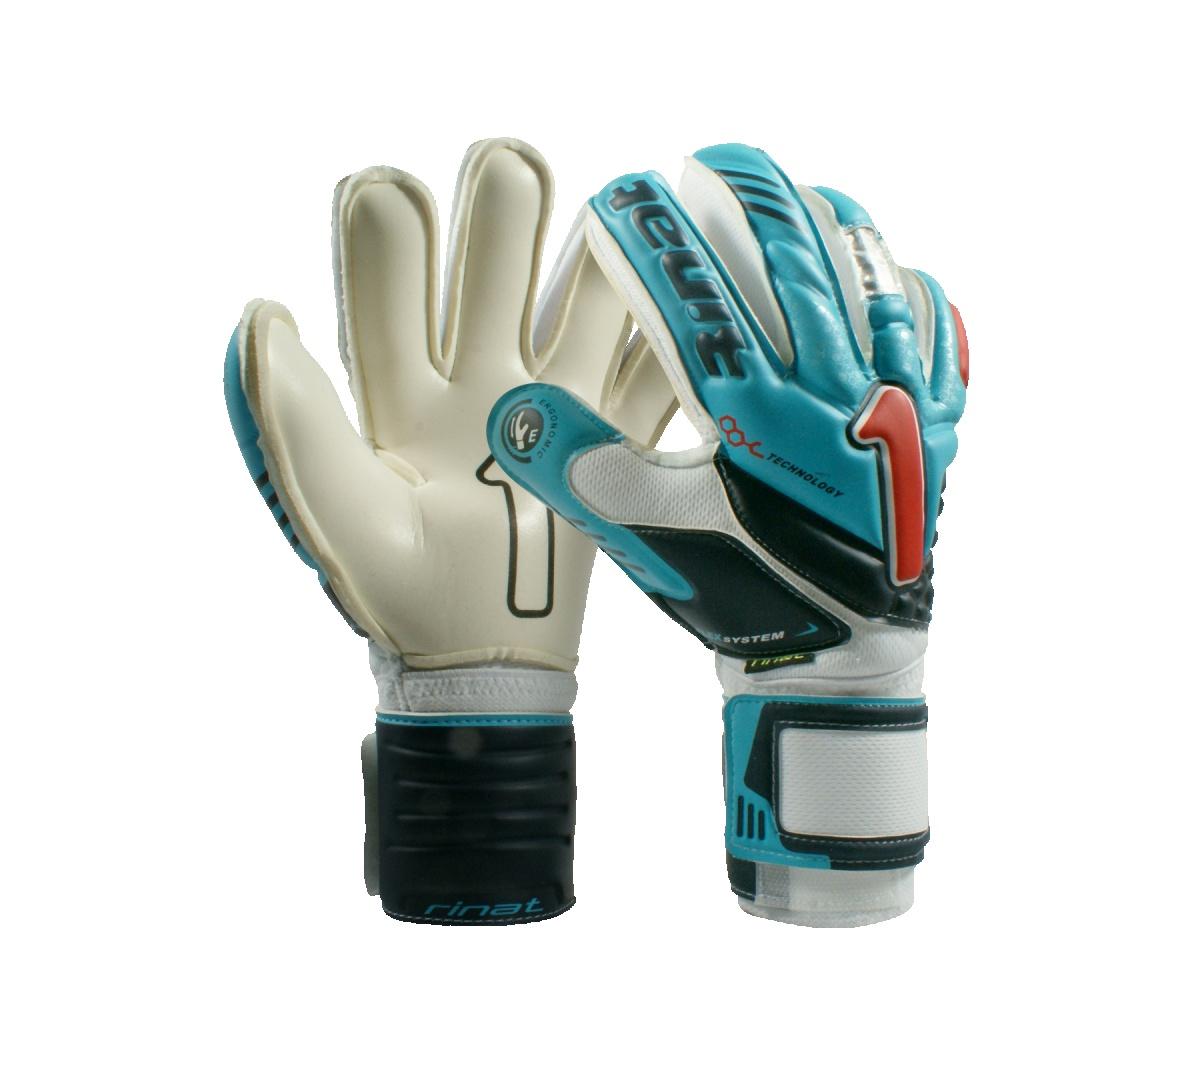 Luva Rinat Arkano Pro Azul Turqueza com Branco - Mundo do Futebol 176650eae75a6